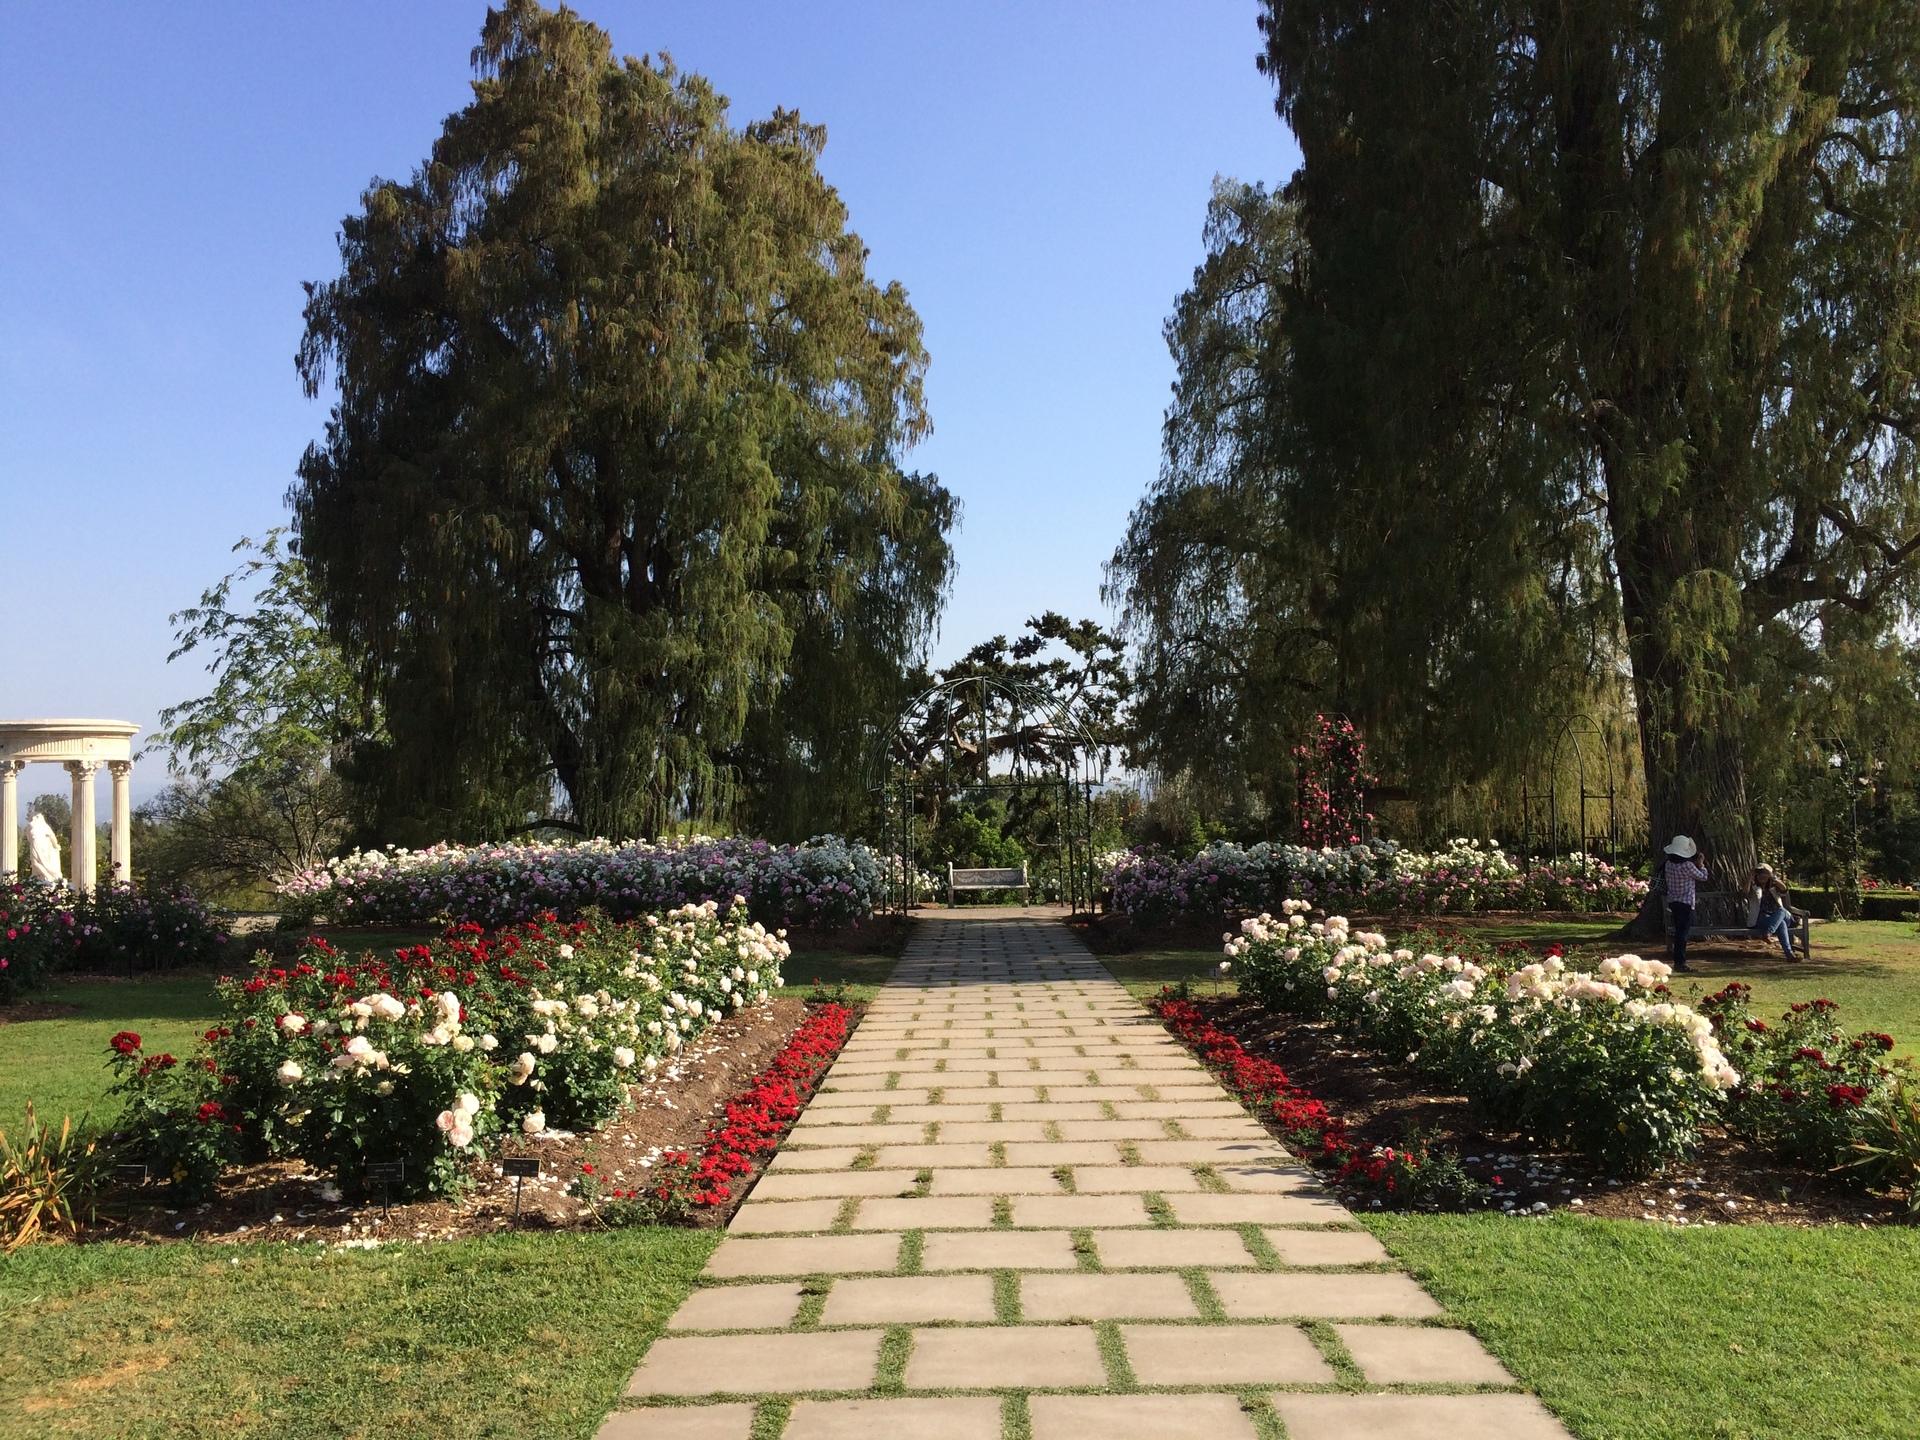 Brick road | bricks, roses, pretty, sylviegirl